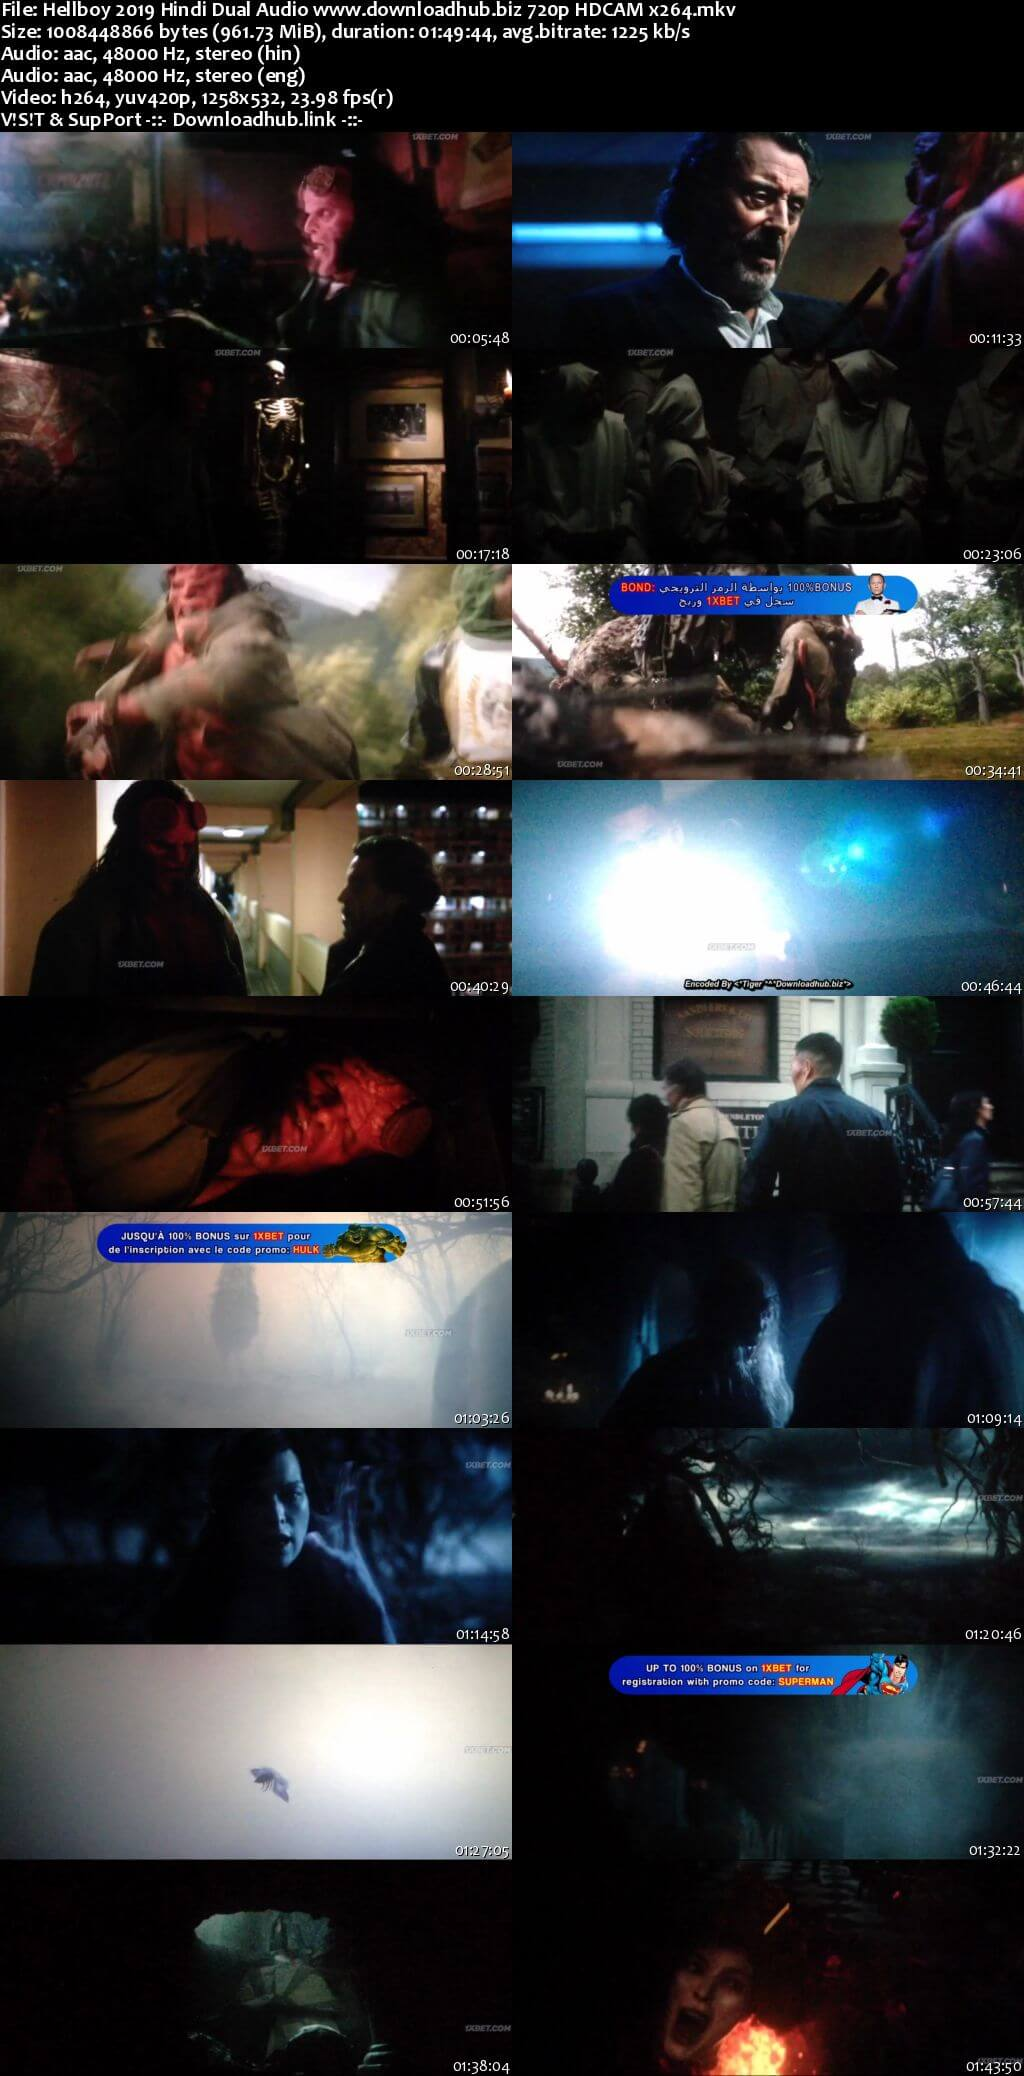 Hellboy 2019 Hindi Dual Audio 720p HDCAM x264